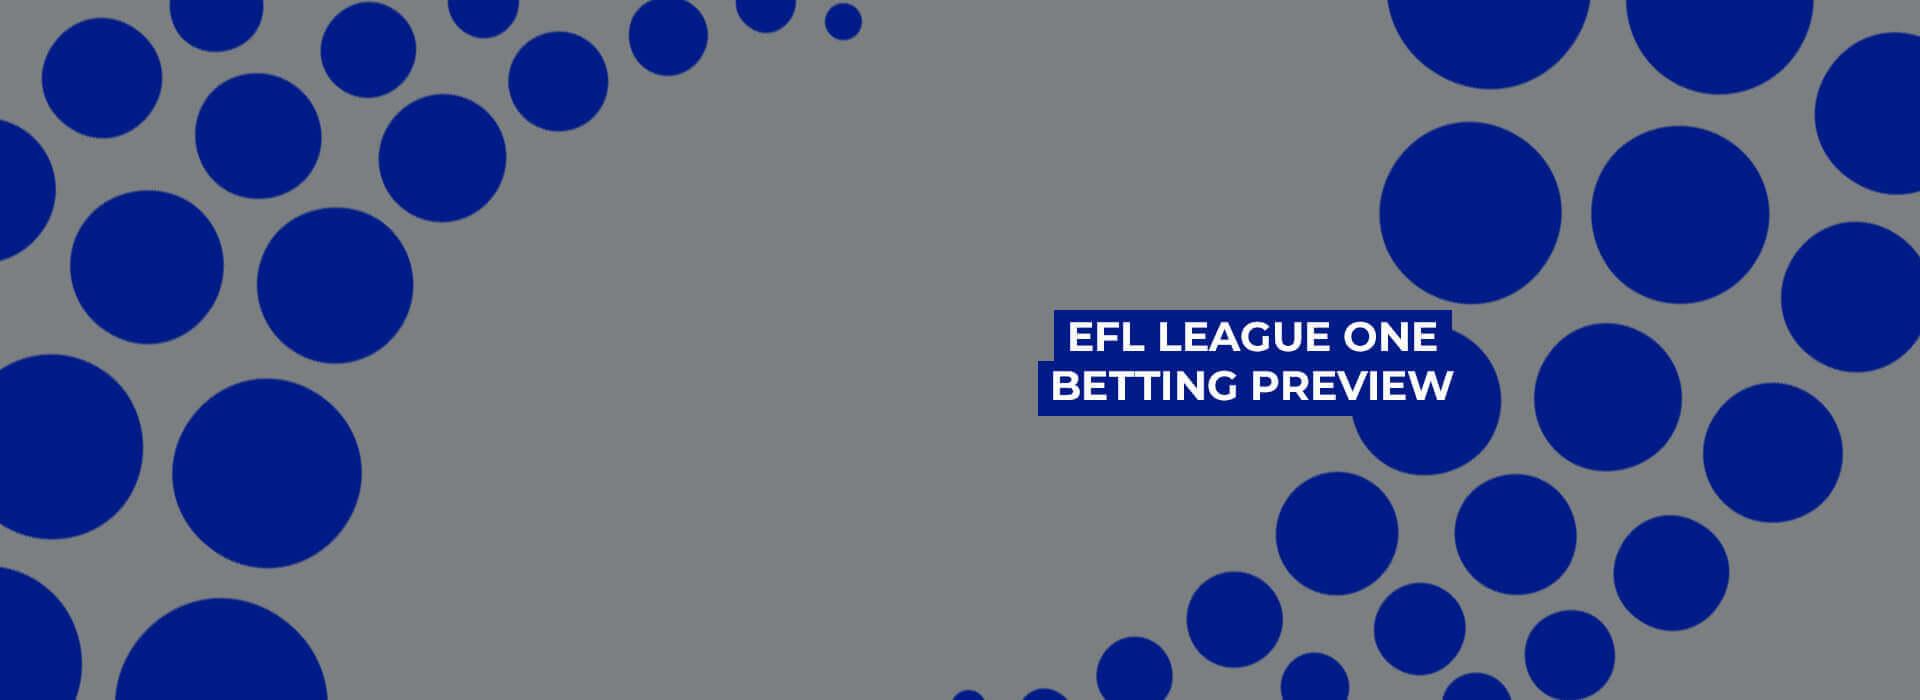 EFL League One Season Betting Preview